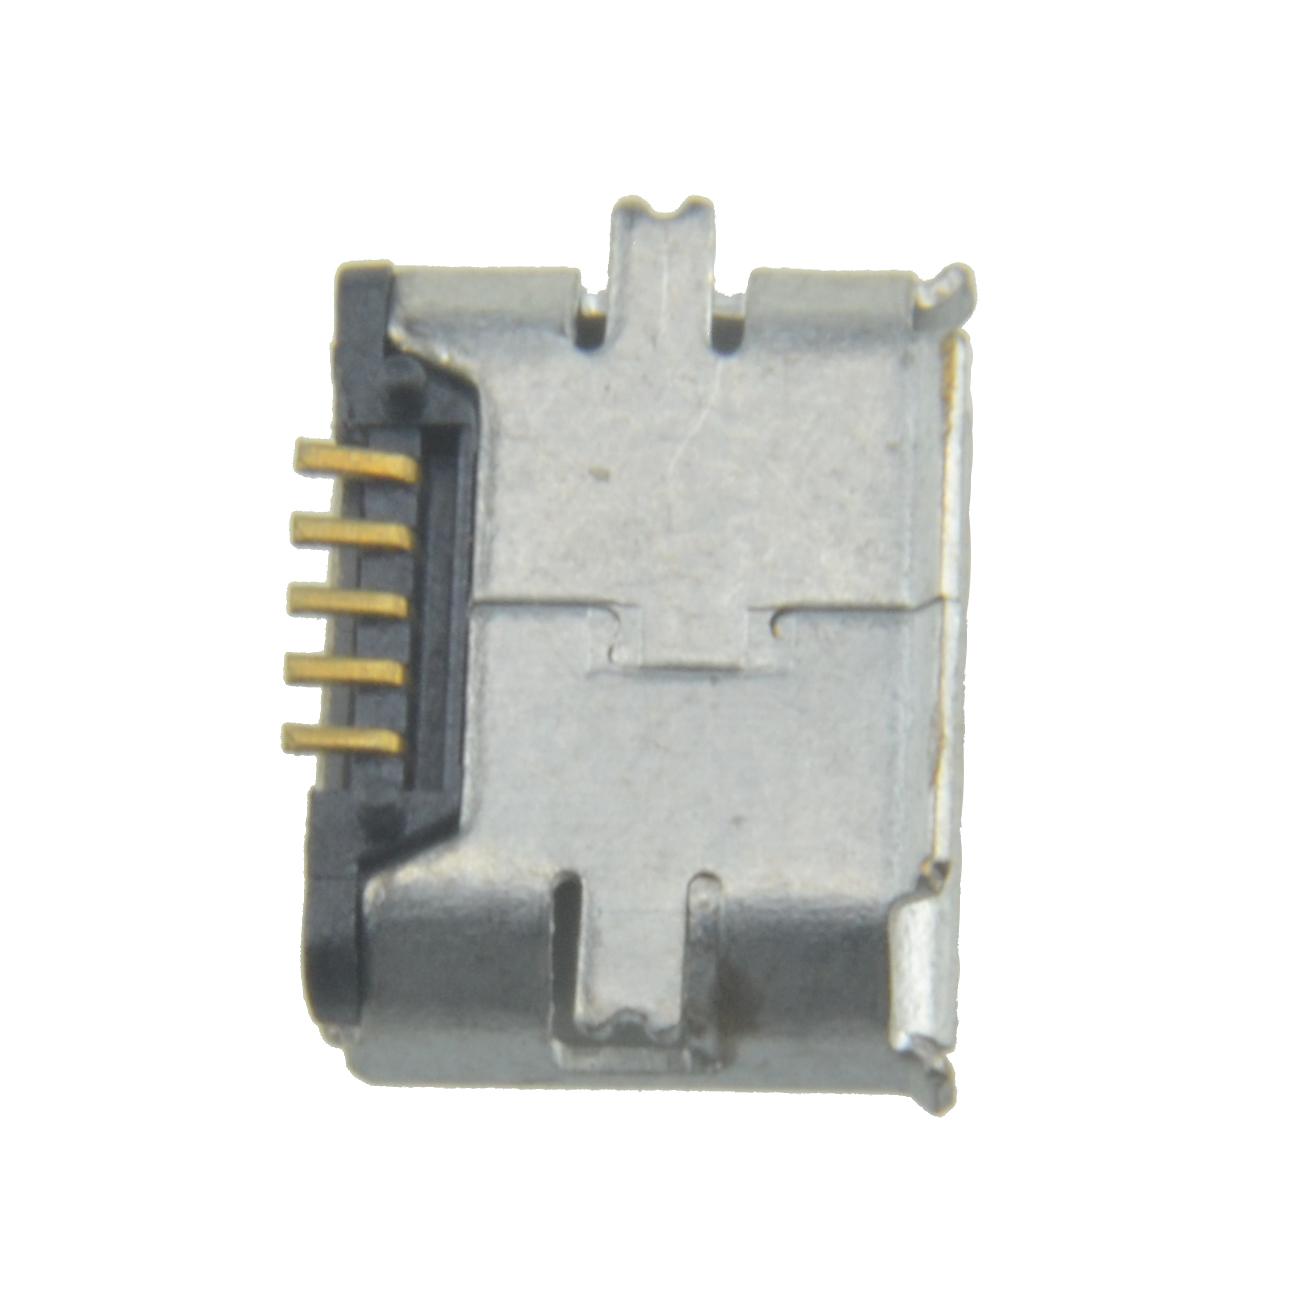 Stk female pin smt micro usb socket connector jacks